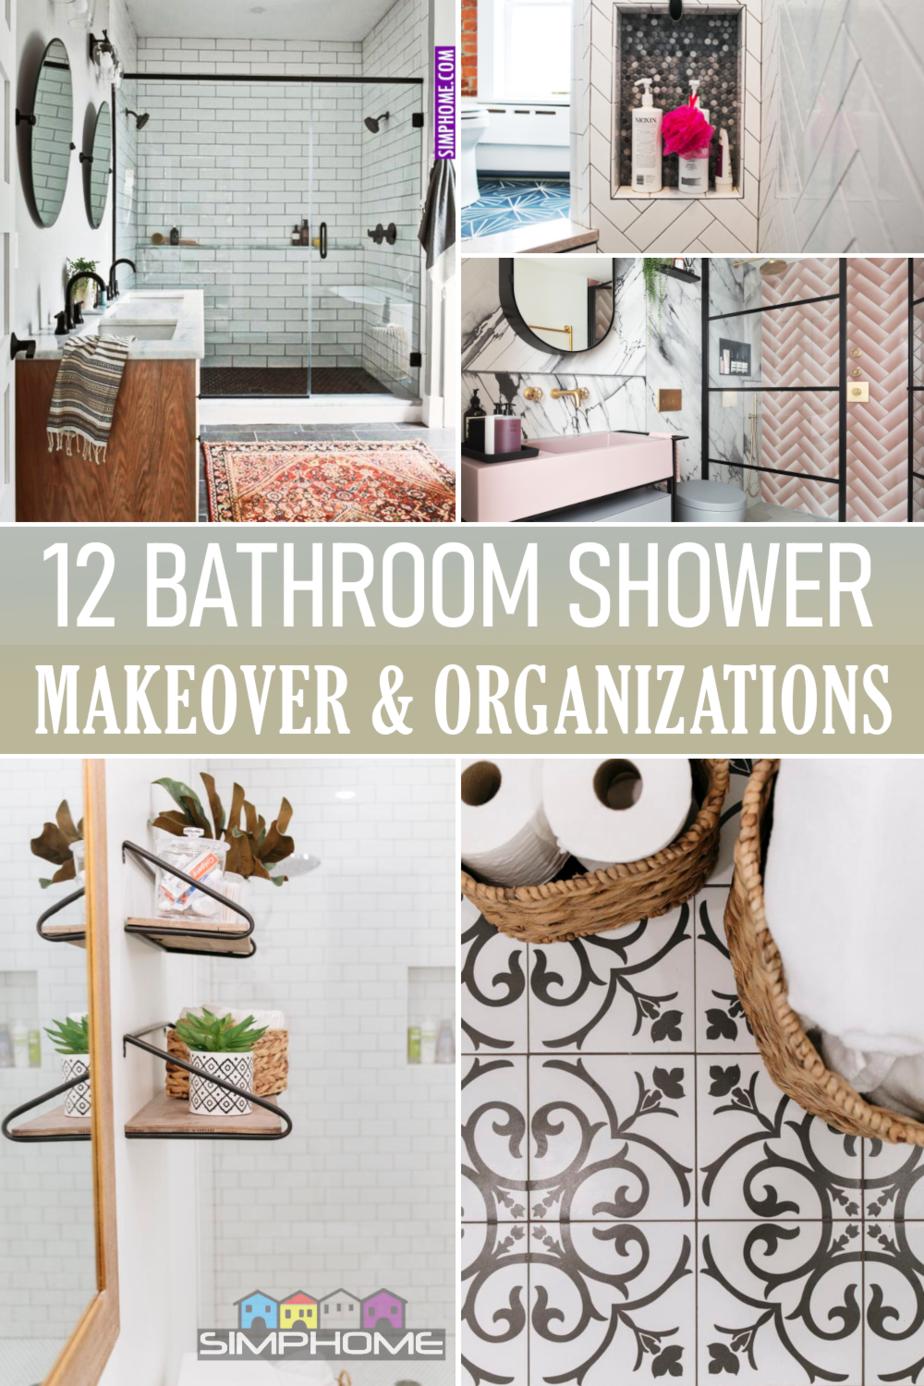 12 Bathroom Shower Makeovers via Simphome.comFeatured